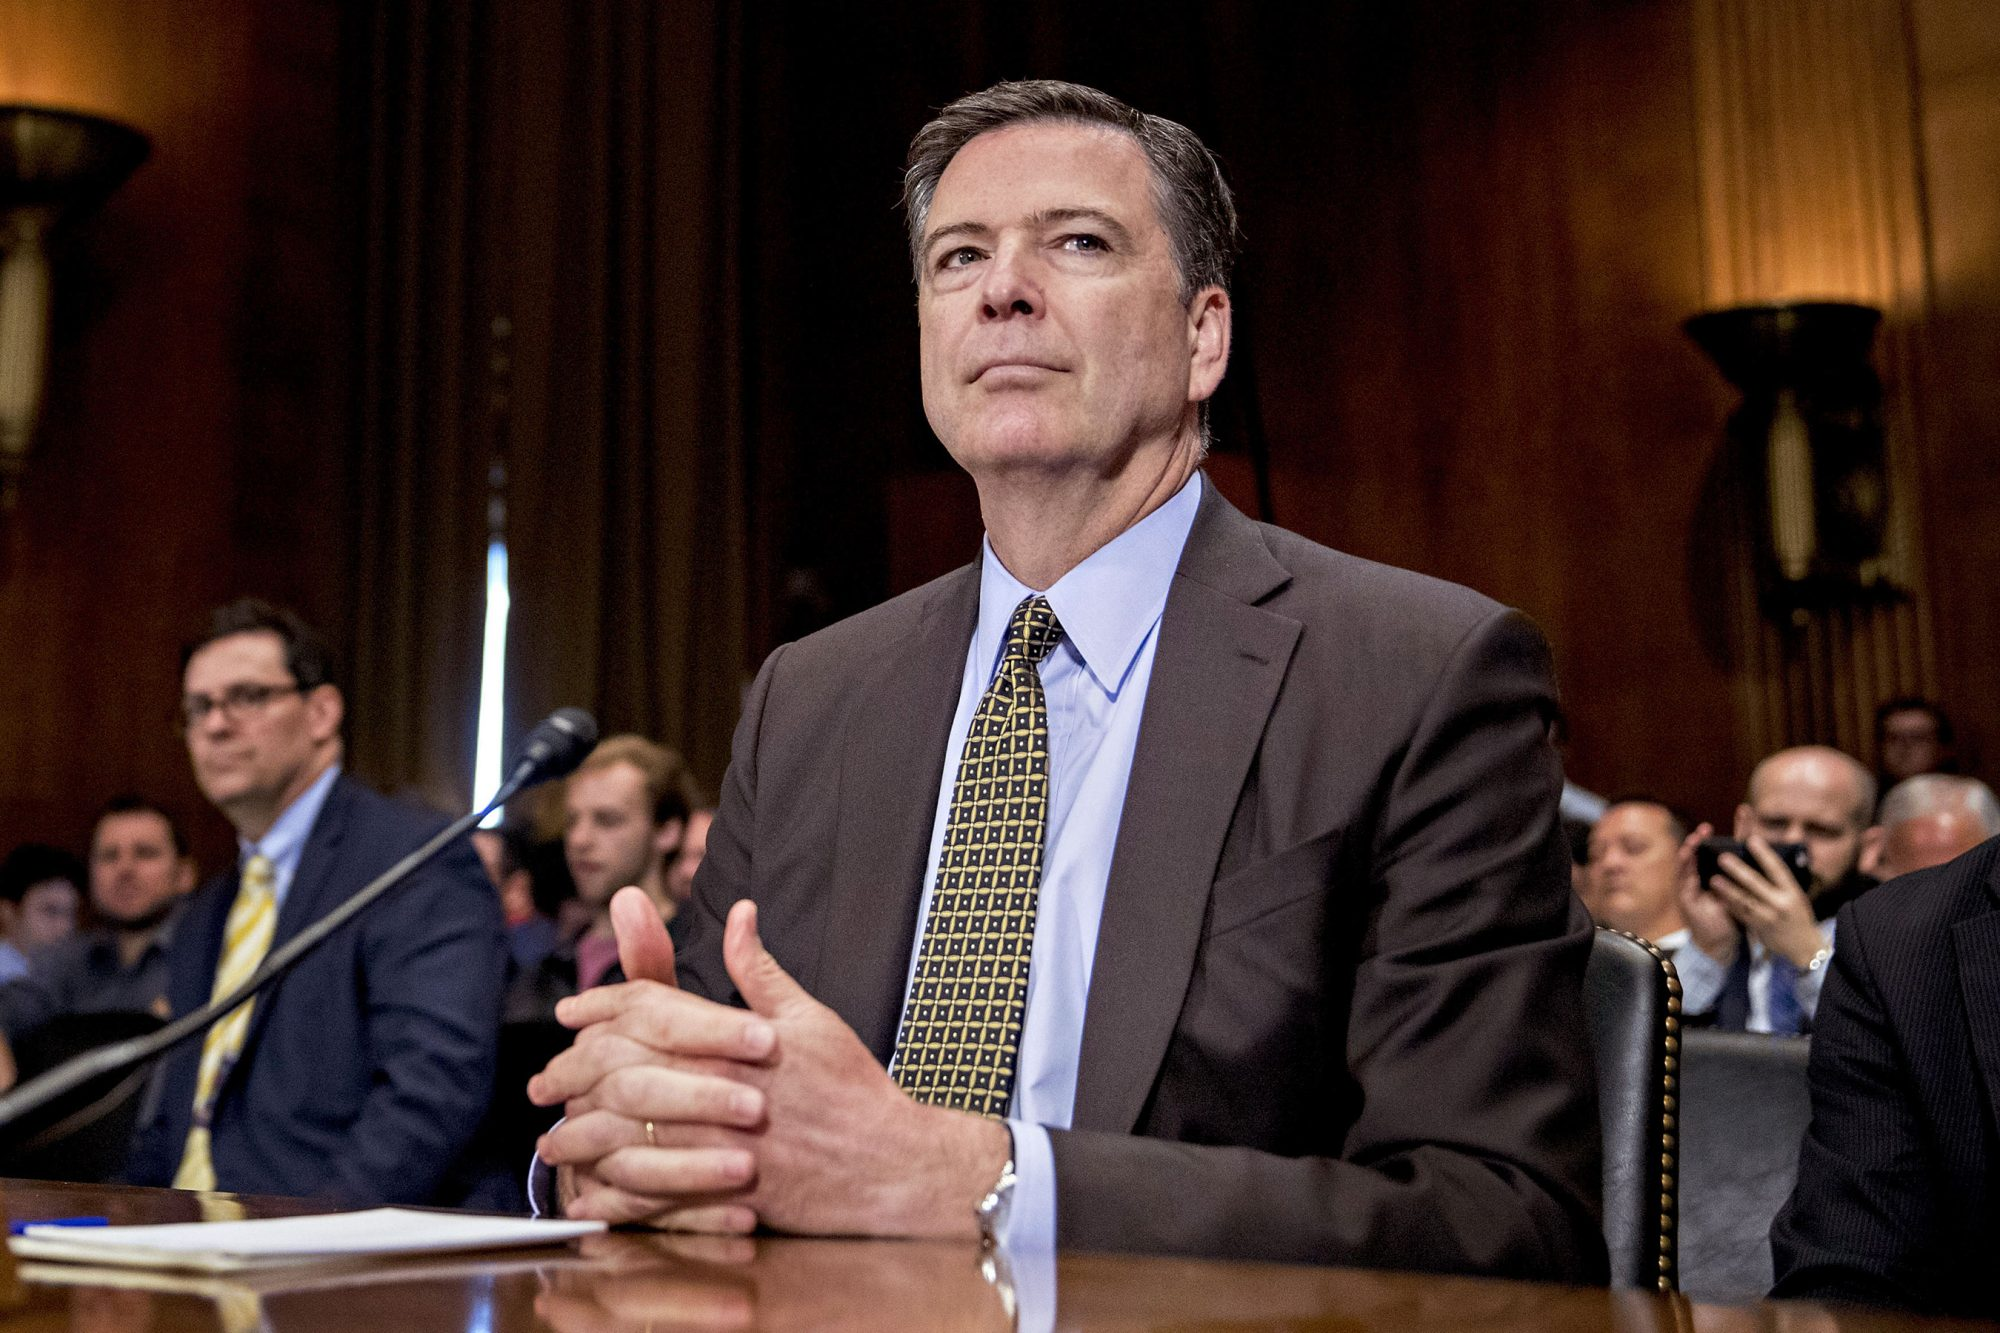 FBI Director James Comey Testifies During Senate Judiciary Hearing